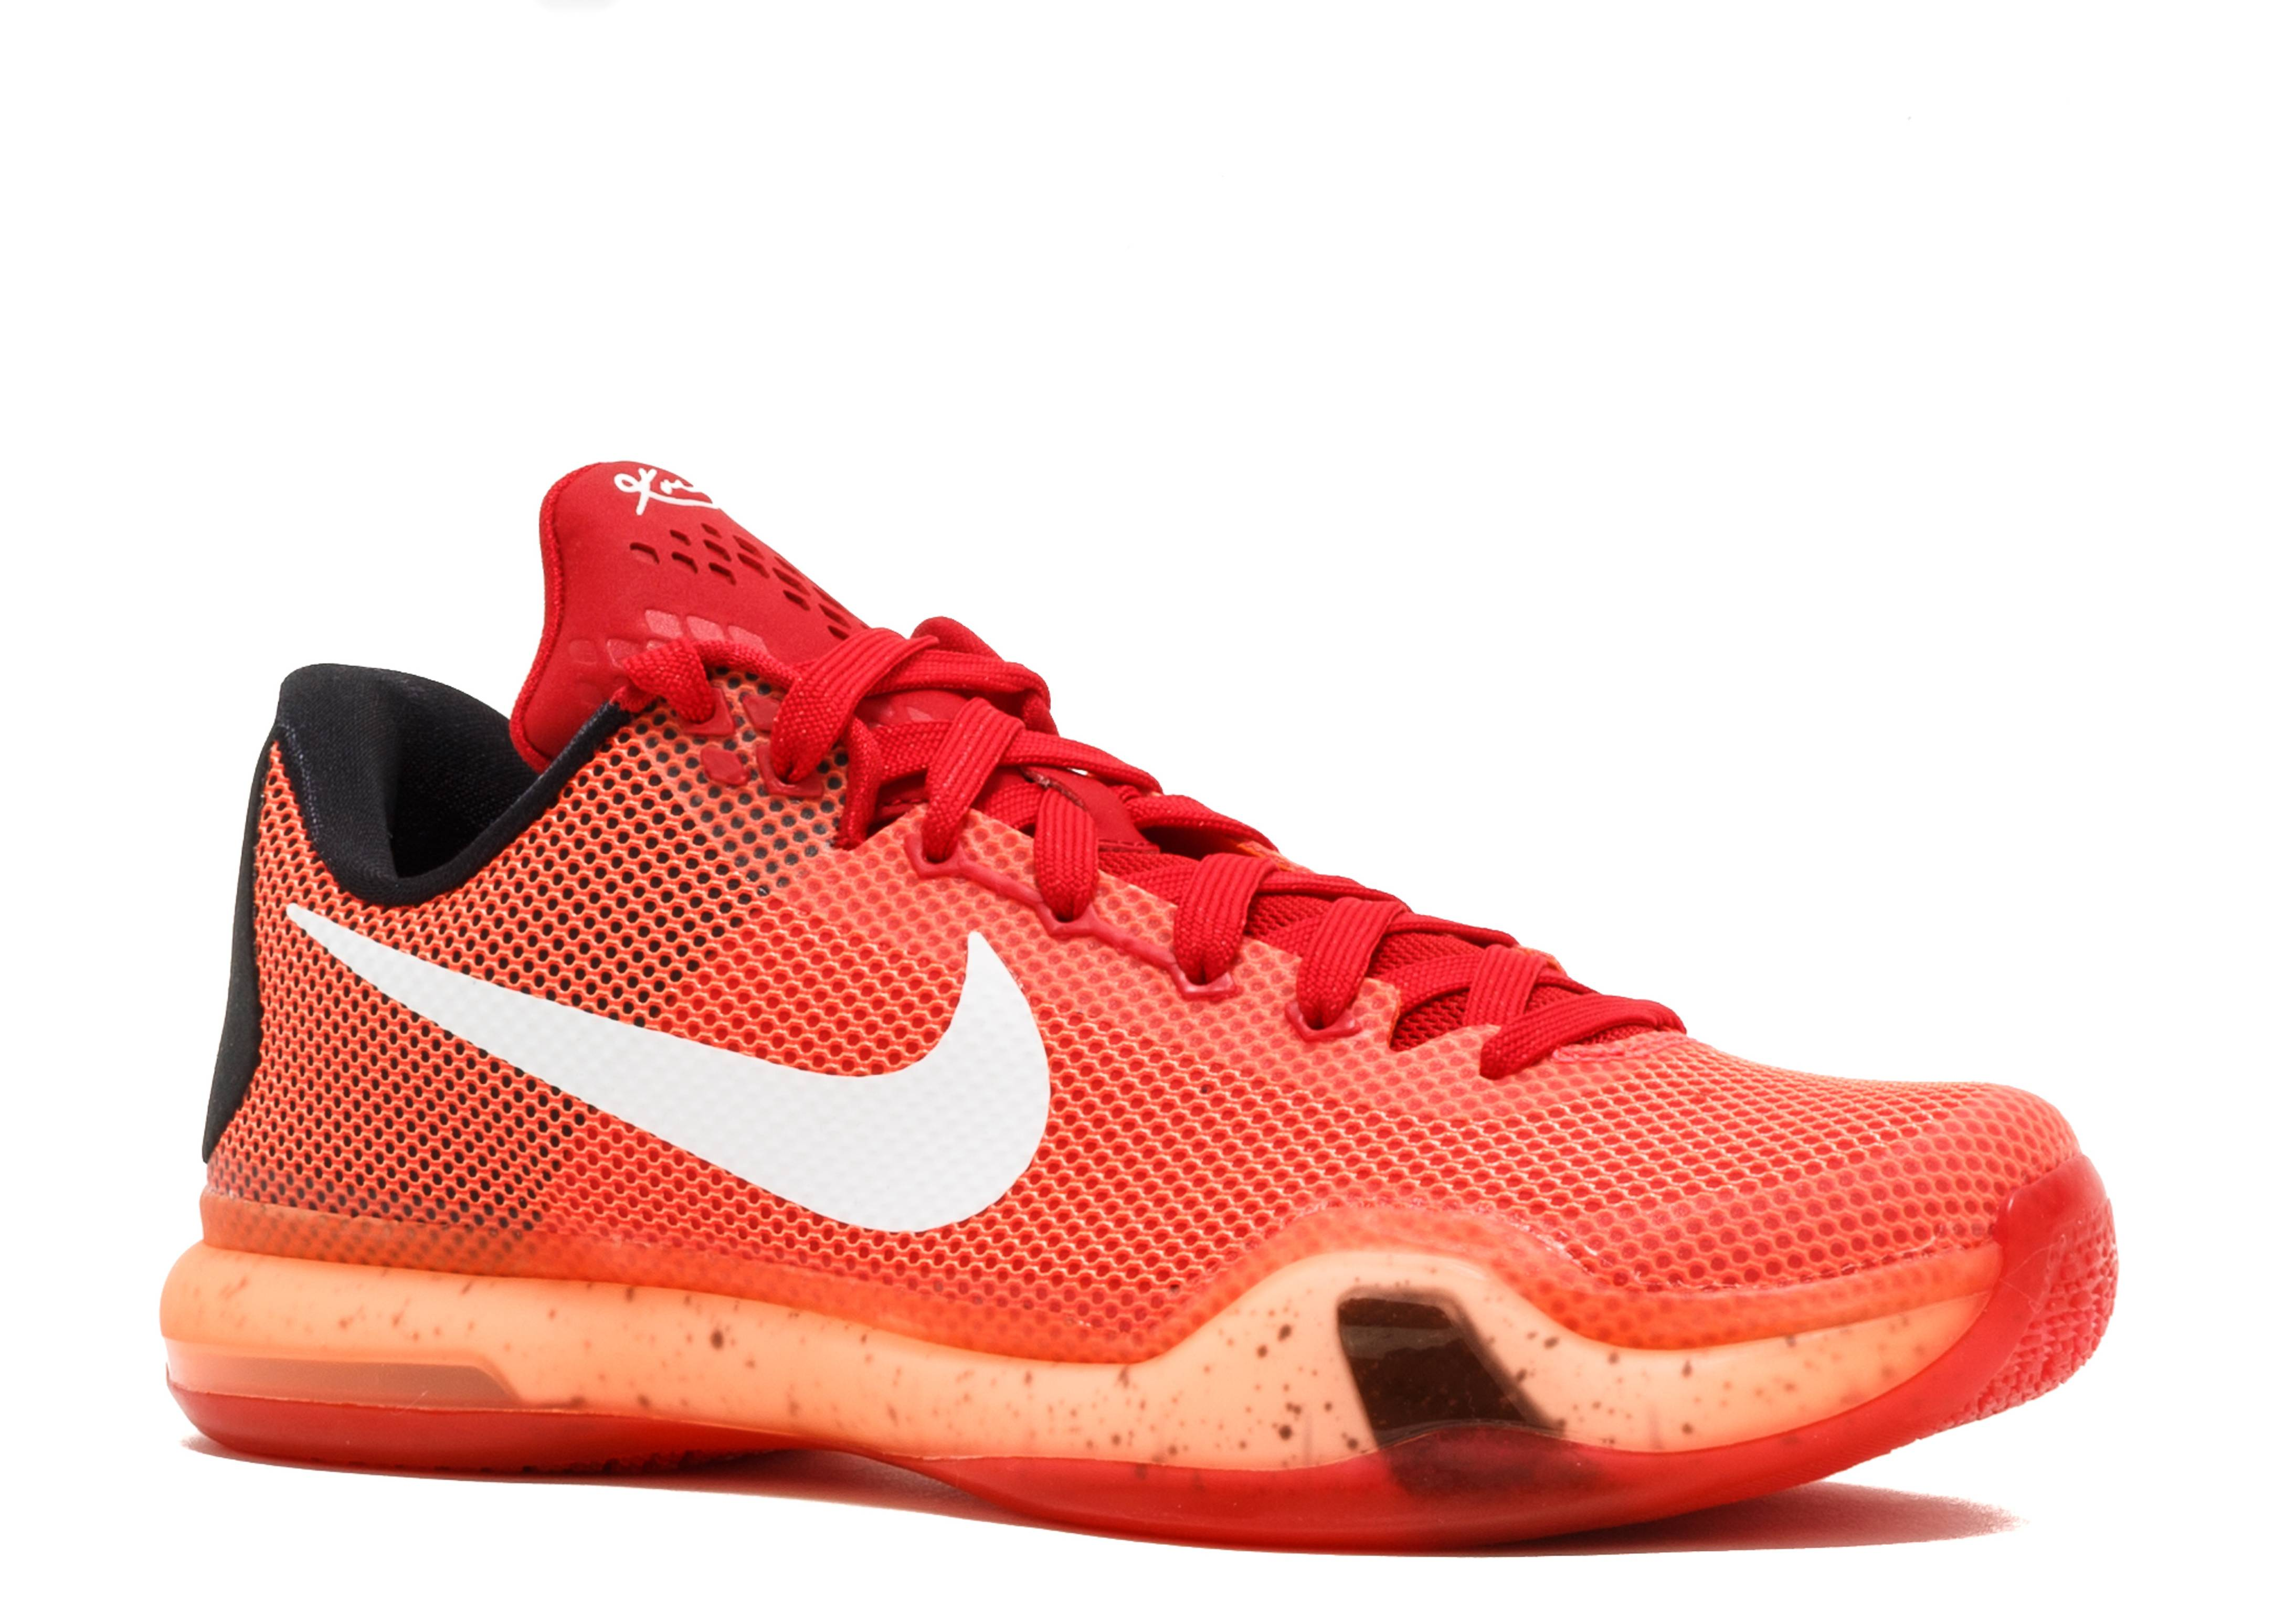 c4d0b769abd3 Kobe 10 - Nike - 705317 616 - university red white-bright crimson-h ...